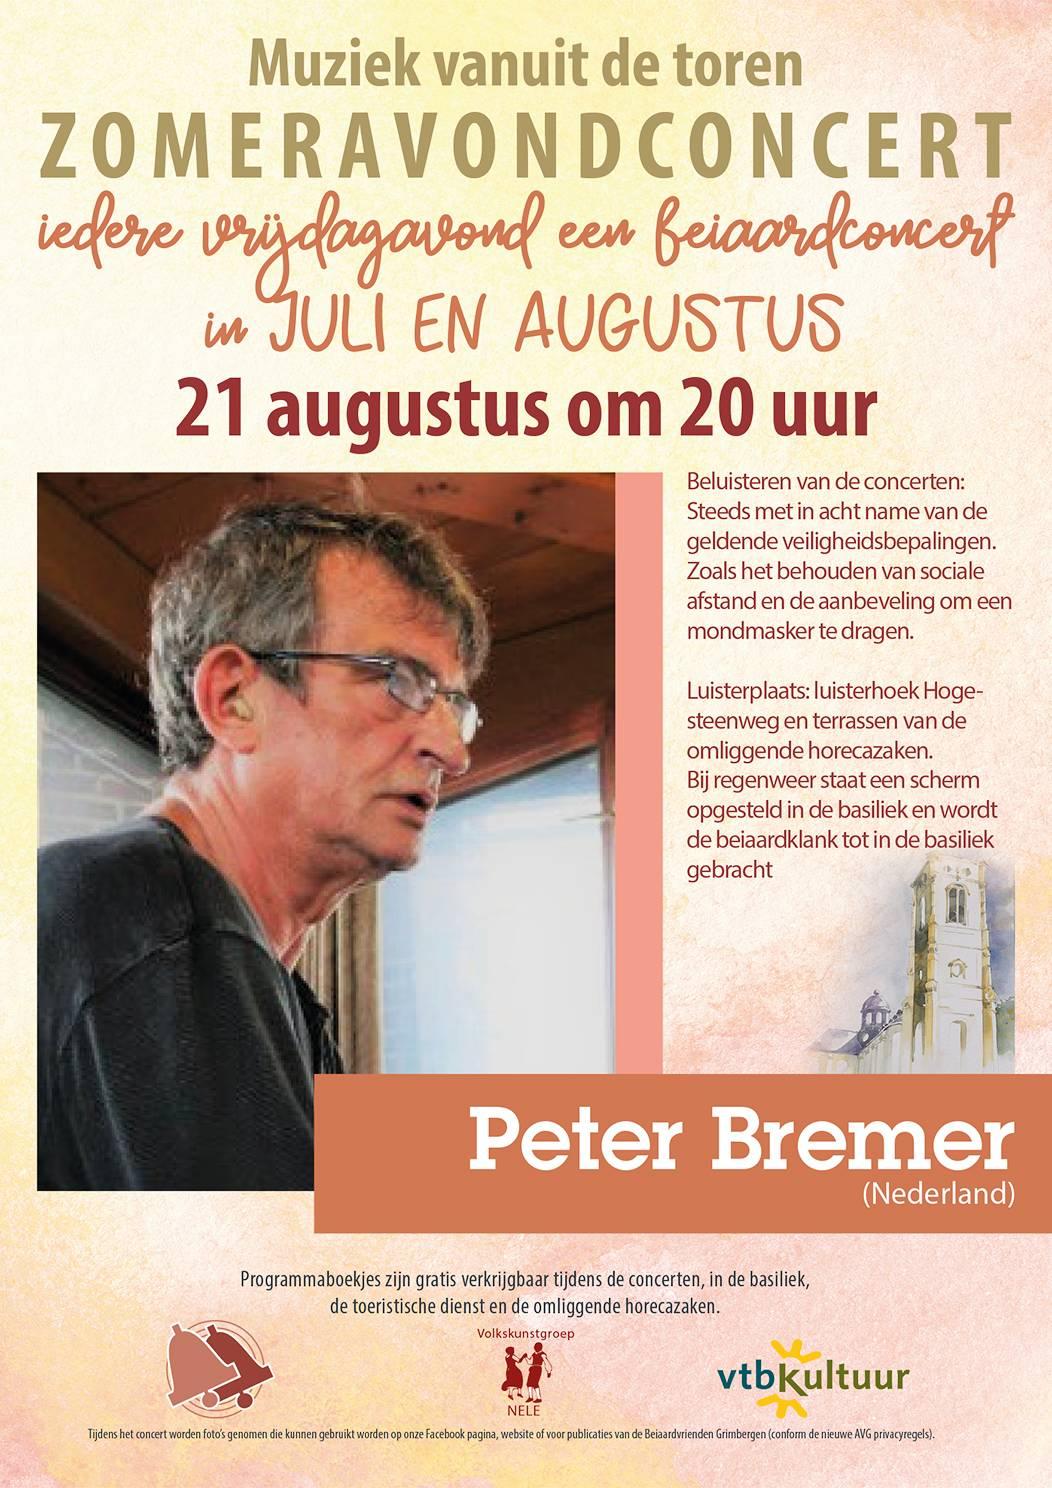 Zomeravondconcerten - Peter Bremer (NL)